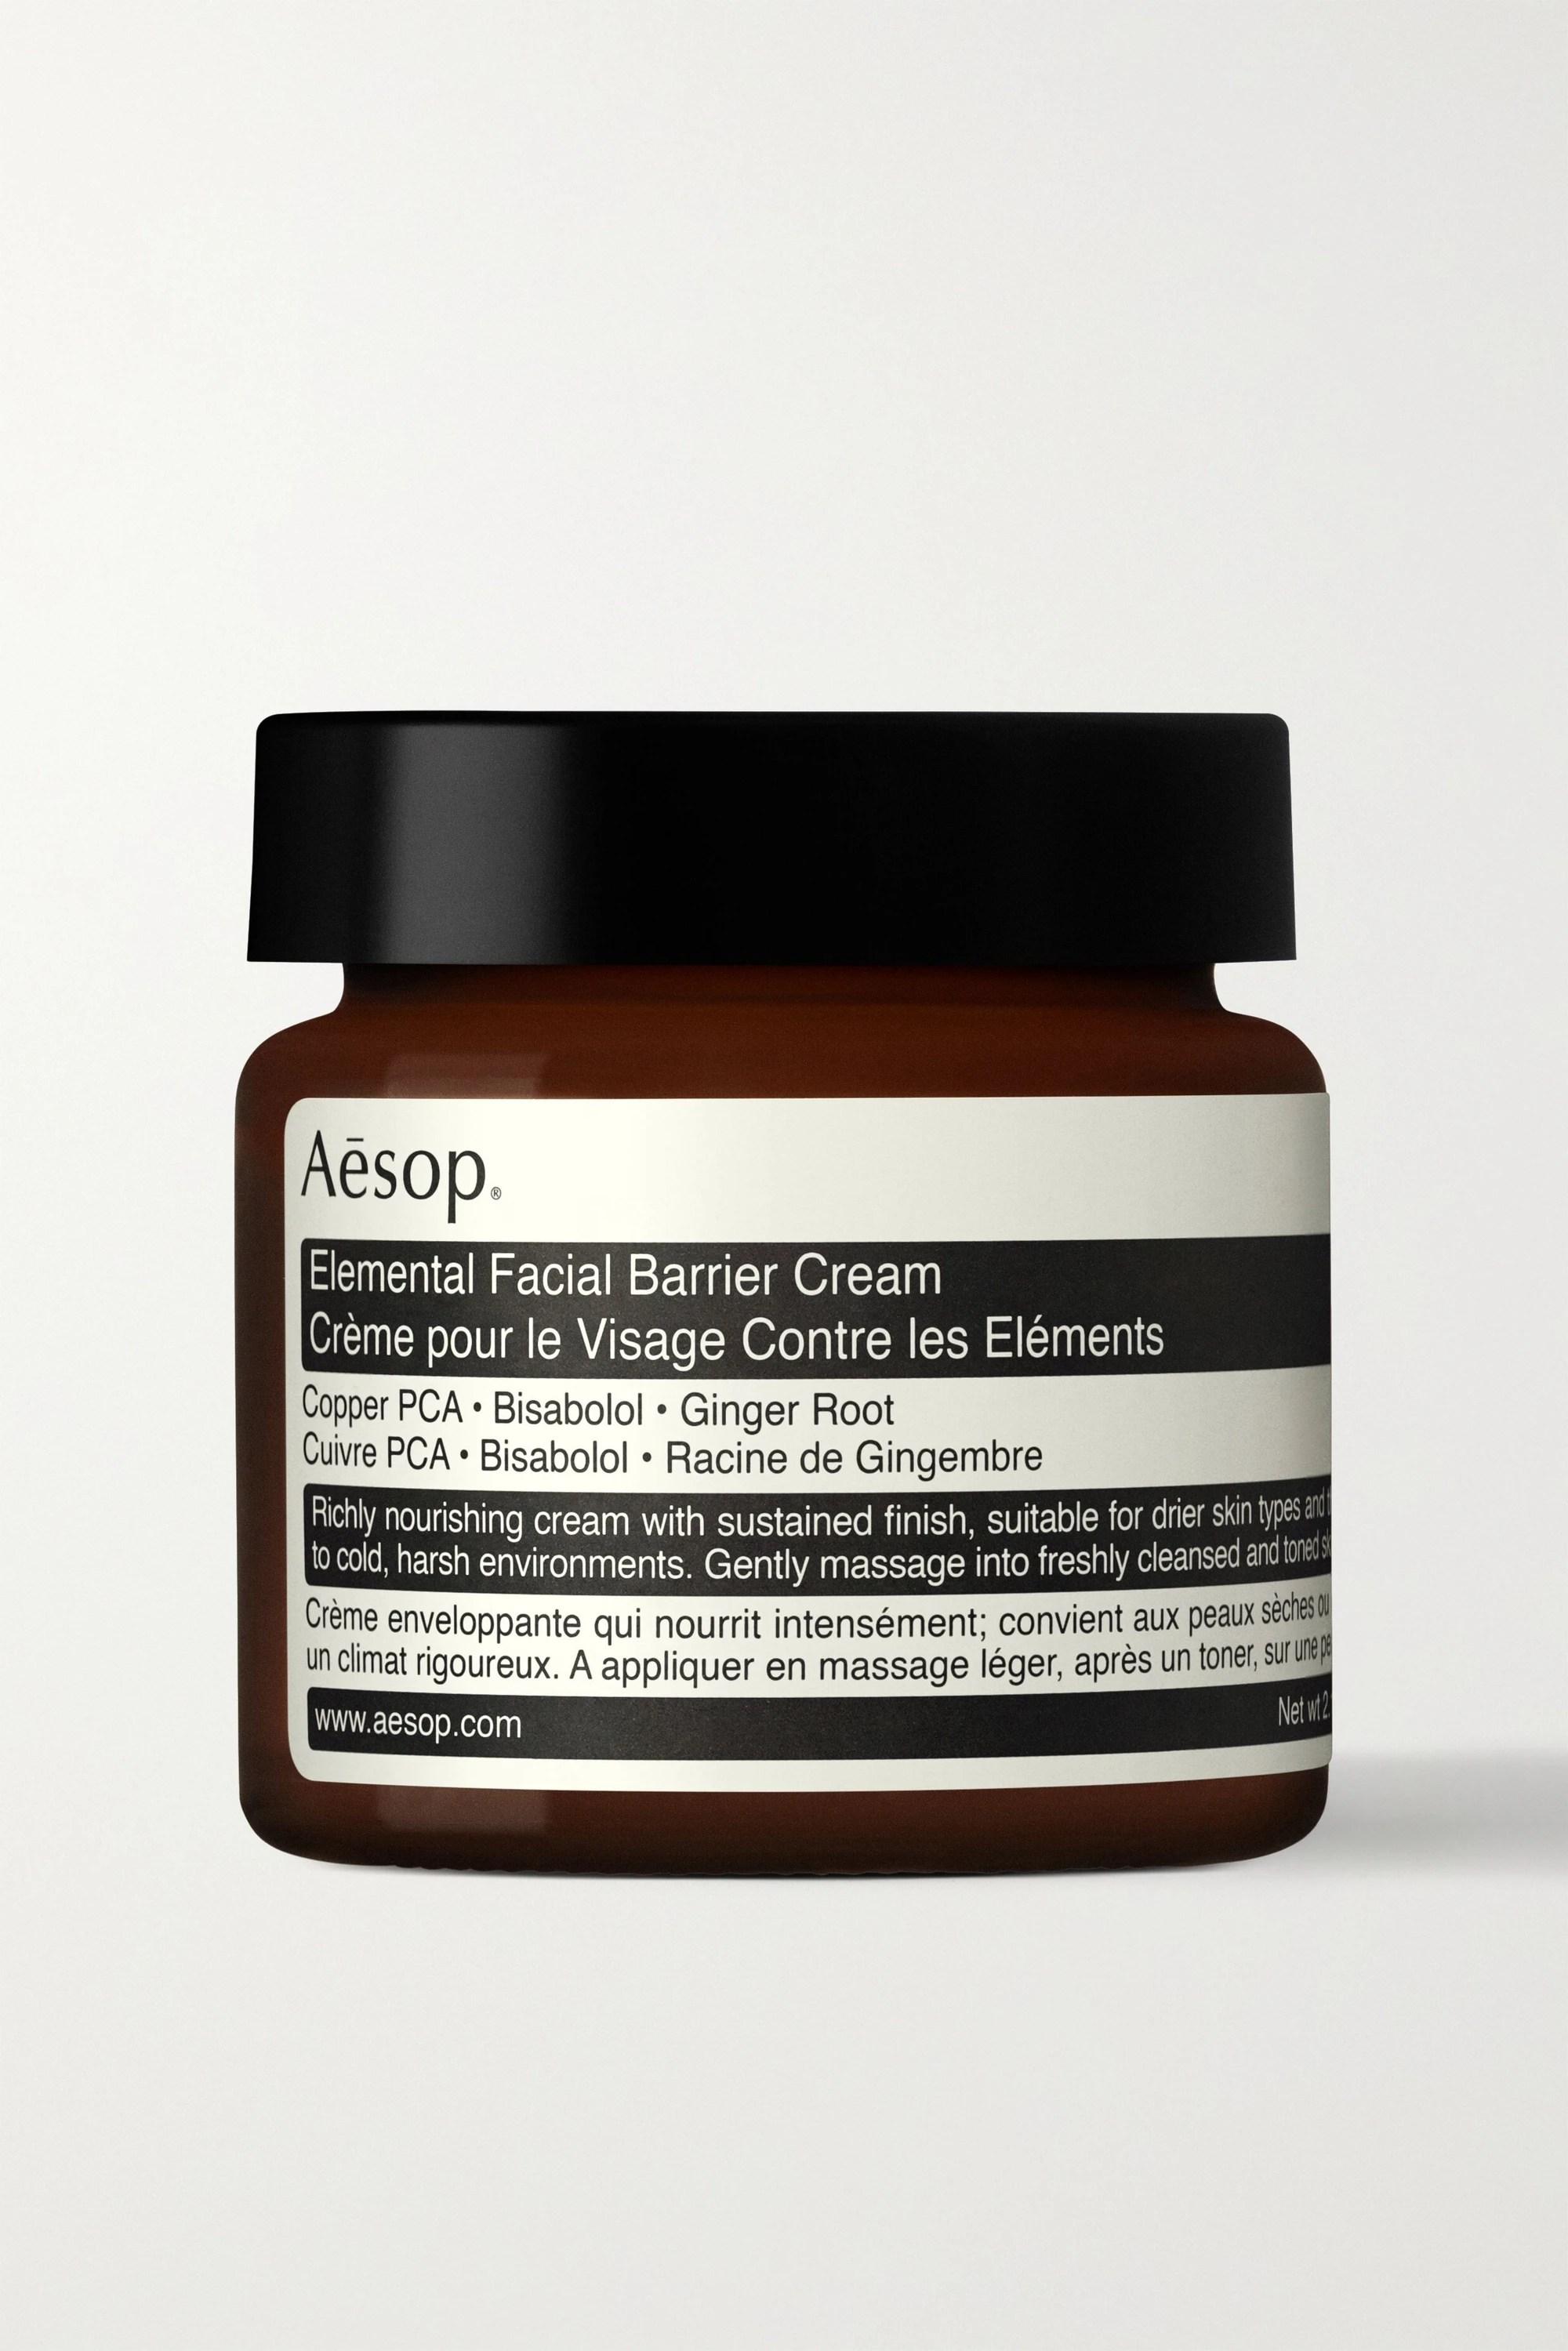 Colorless Elemental Facial Barrier Cream 60ml | Aesop ...